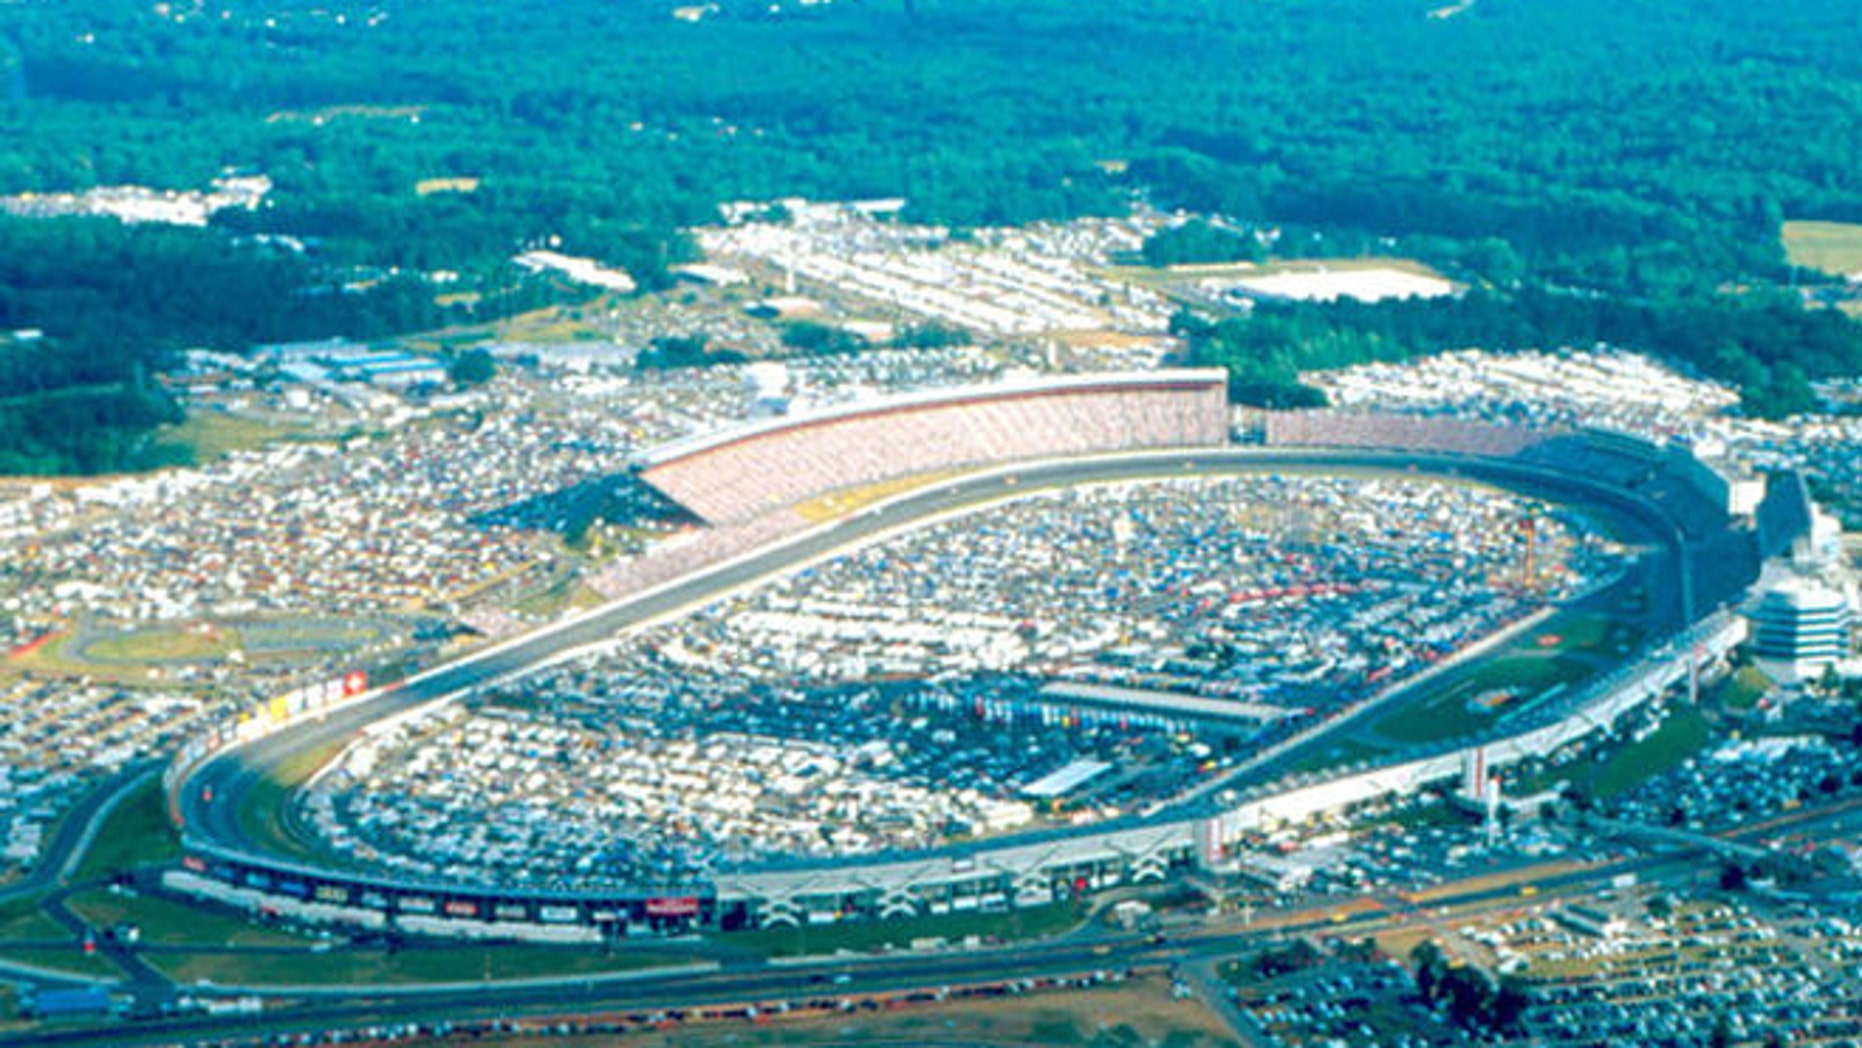 FILE: Charlotte Motor Speedway, outside Charlotte, N.C.